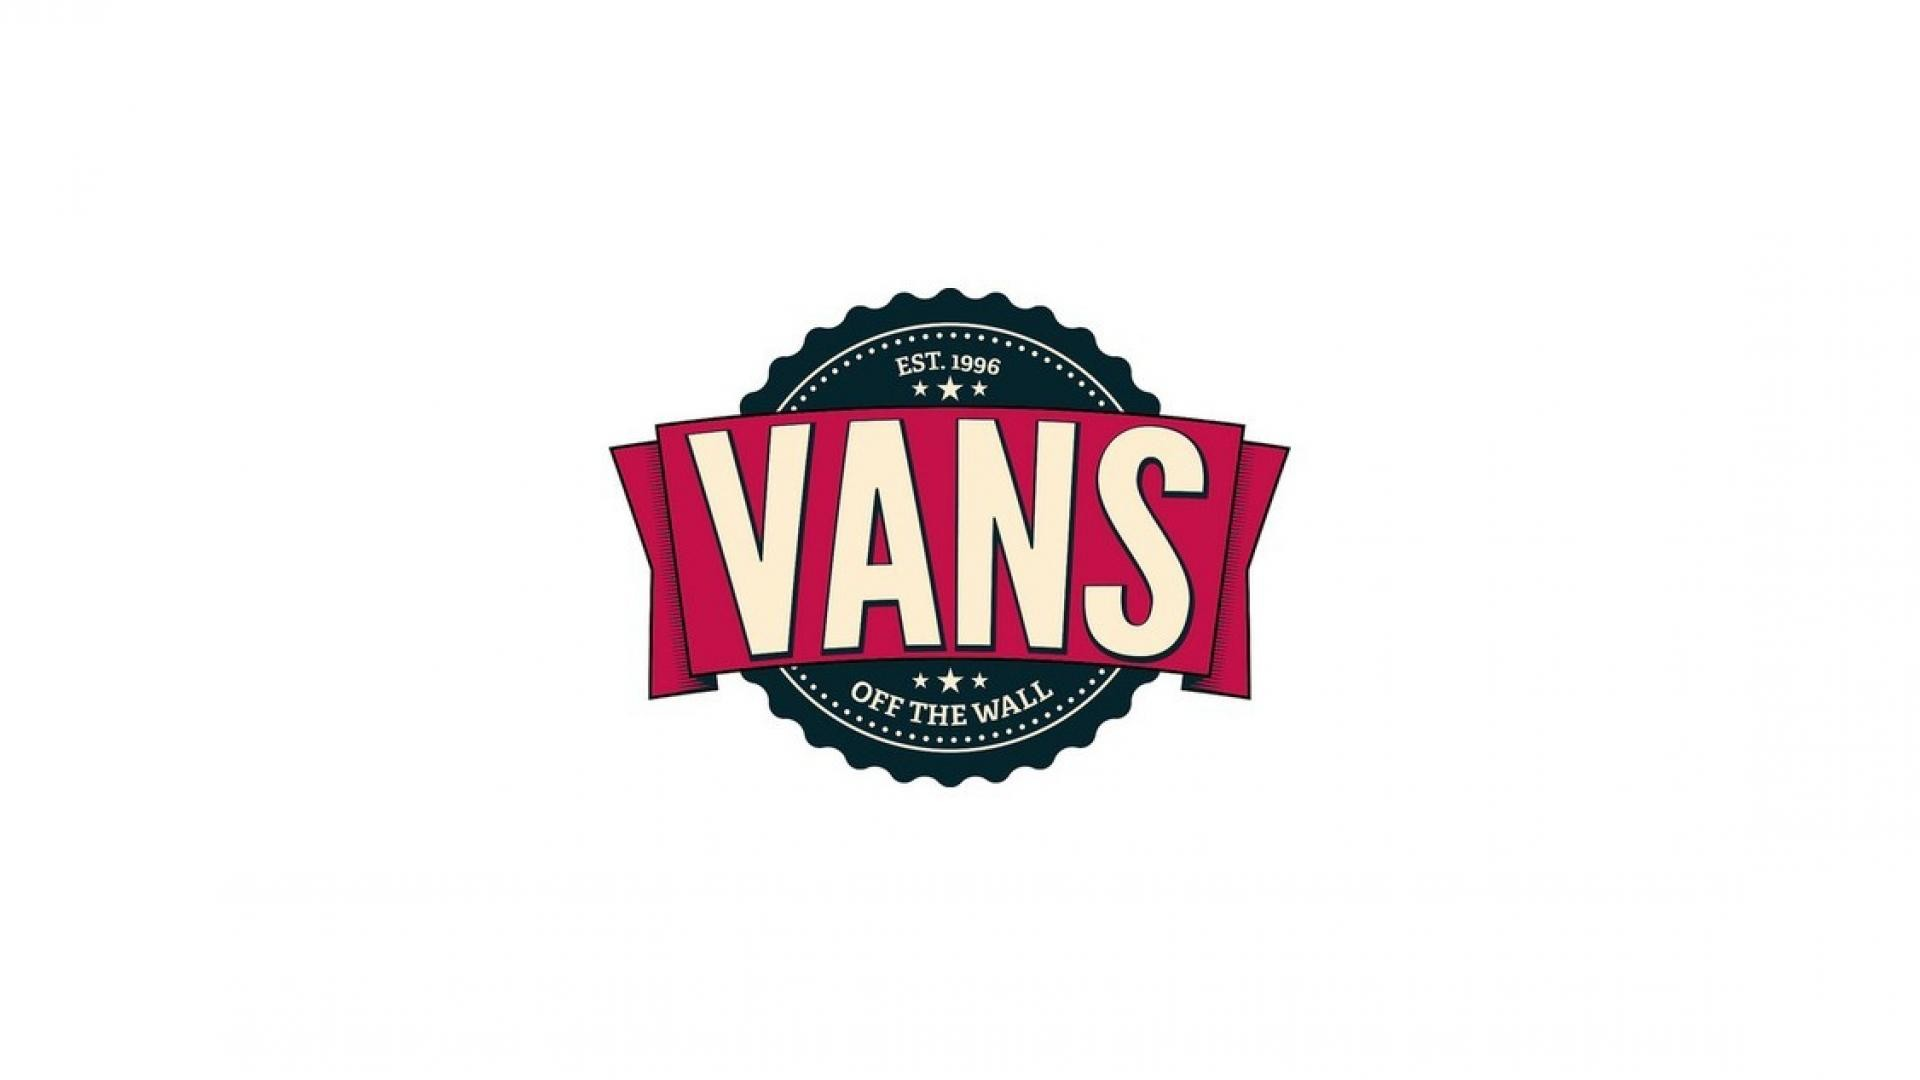 Vans Wallpaper Iphone Hd 61 Images